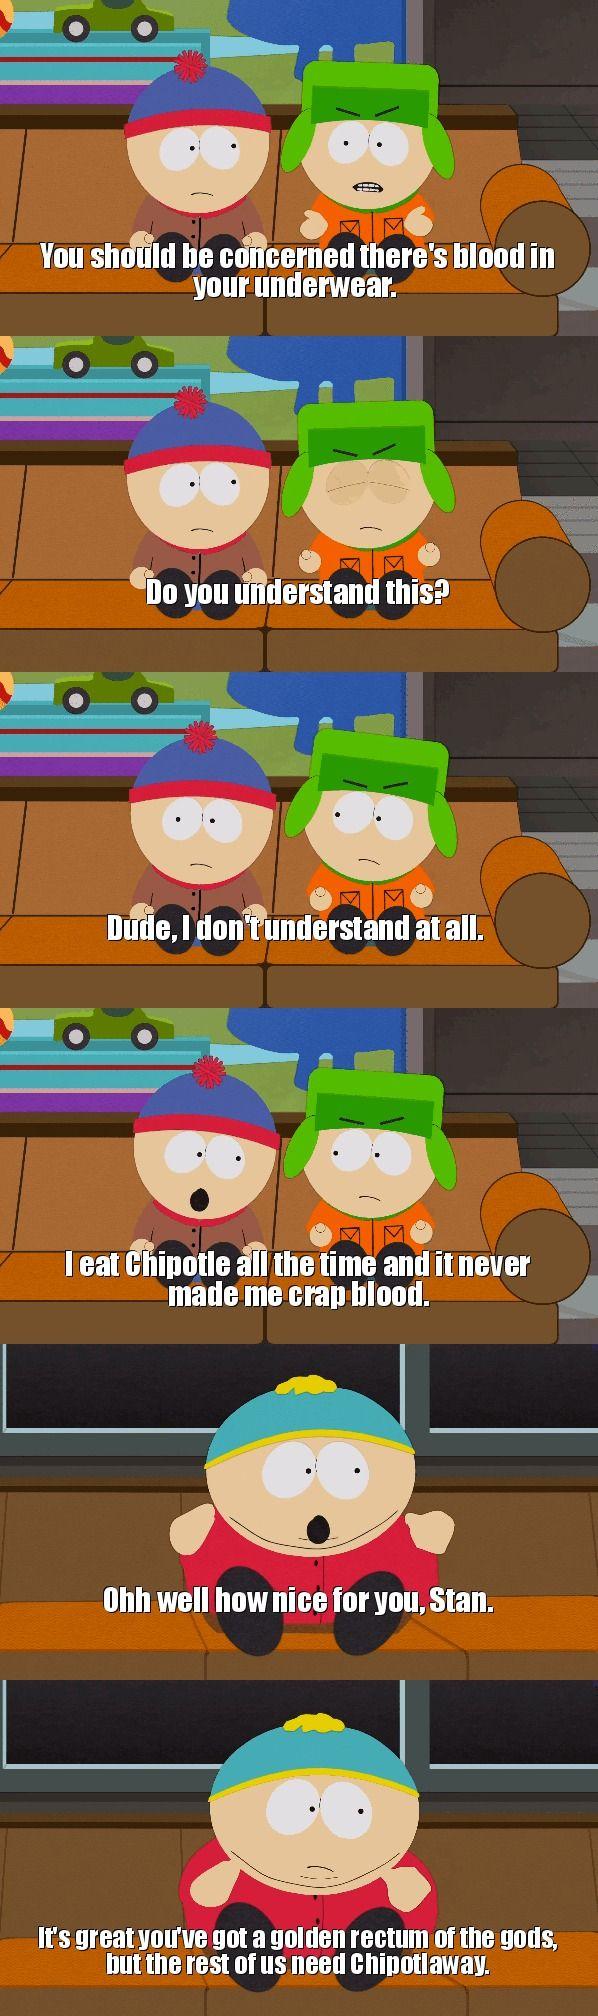 "South Park ""rectum of the gods"""